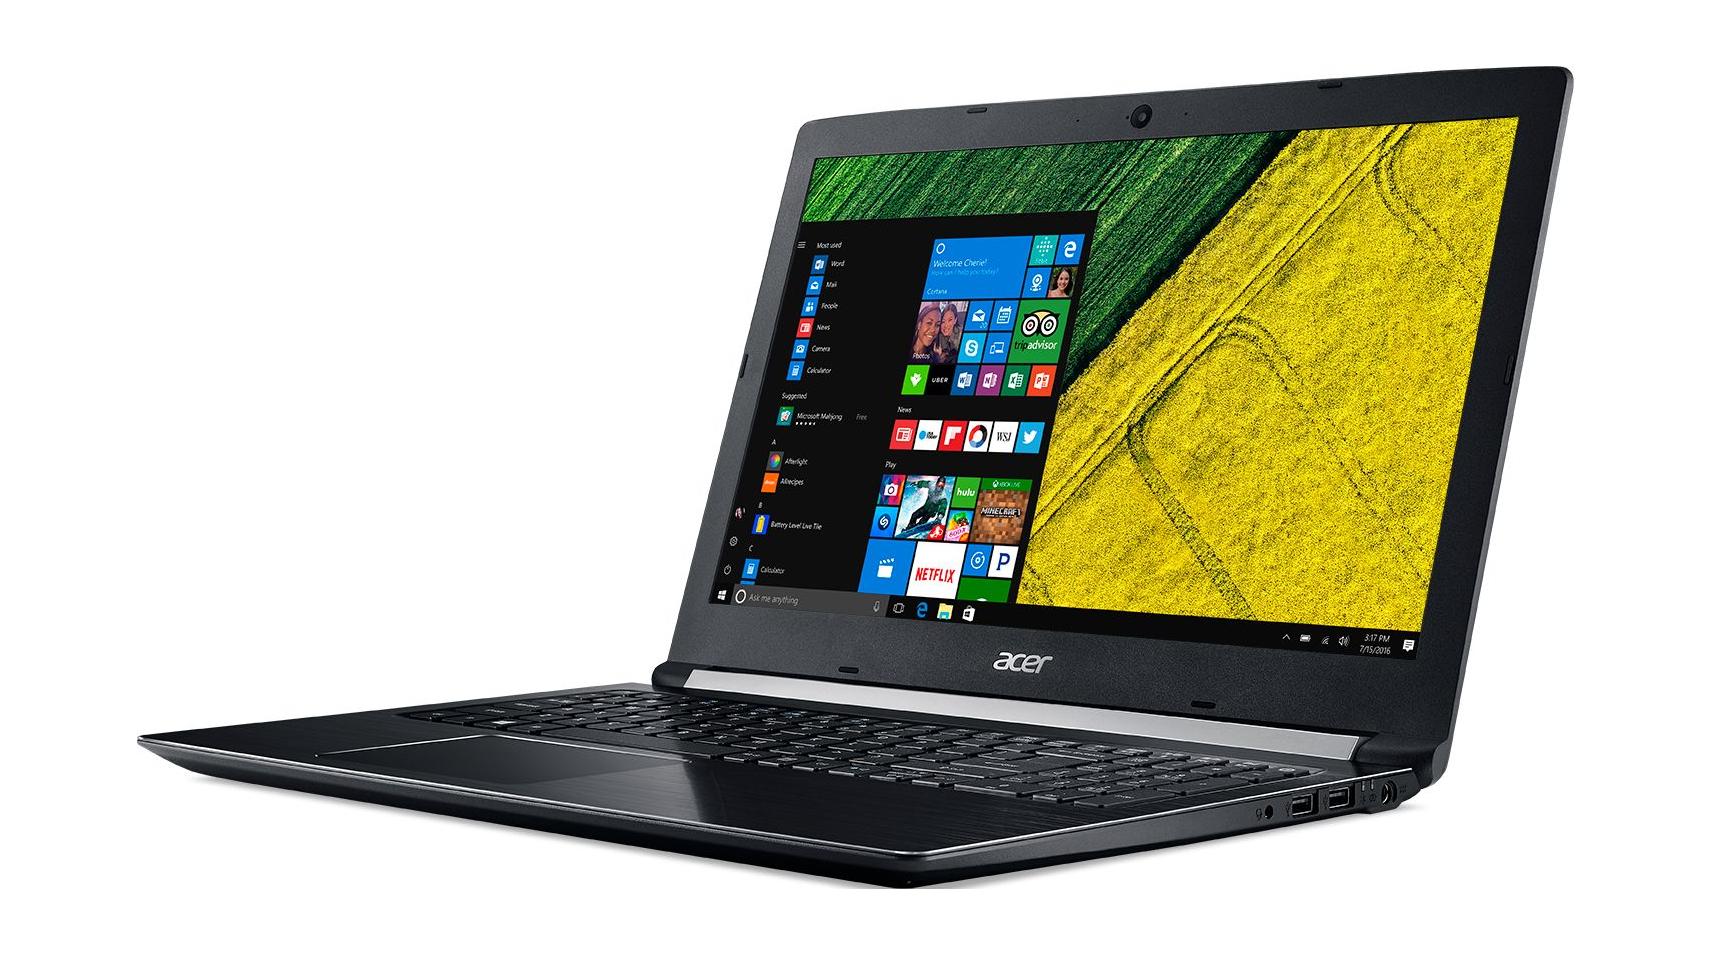 "PC Portable 15.6"" Acer Aspire A515-51G-70JR (FHD, Core i7-7500U, GeForce MX 150, 8Go RAM, 256Go SSD + 1To HDD)"